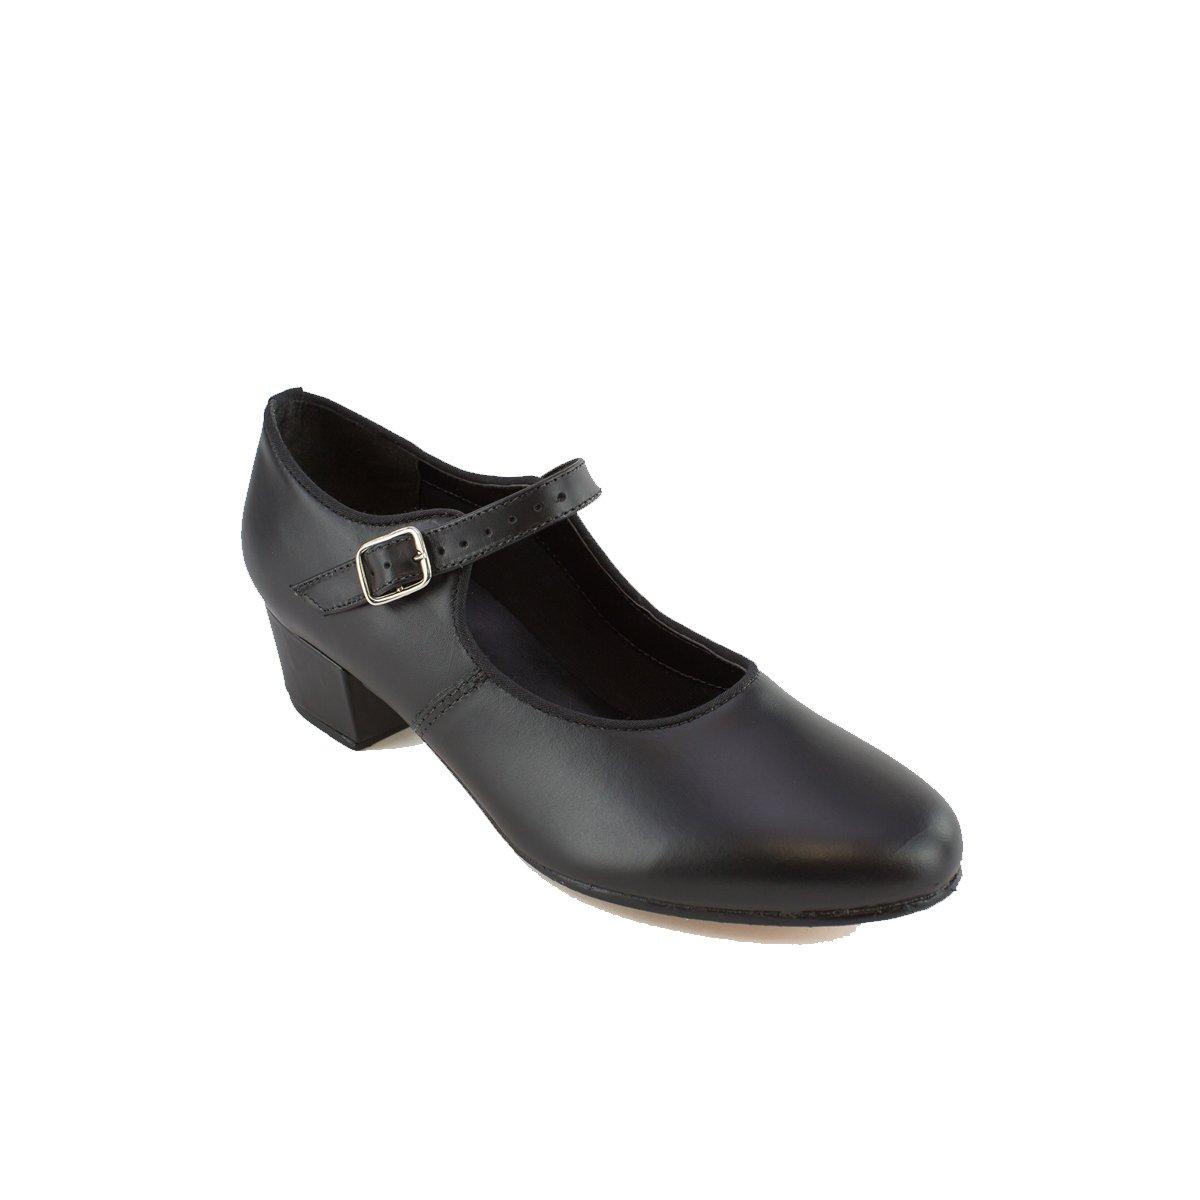 Sodanca Ch-01 Adult Caitlin 1 Cuban Heel Character Shoe